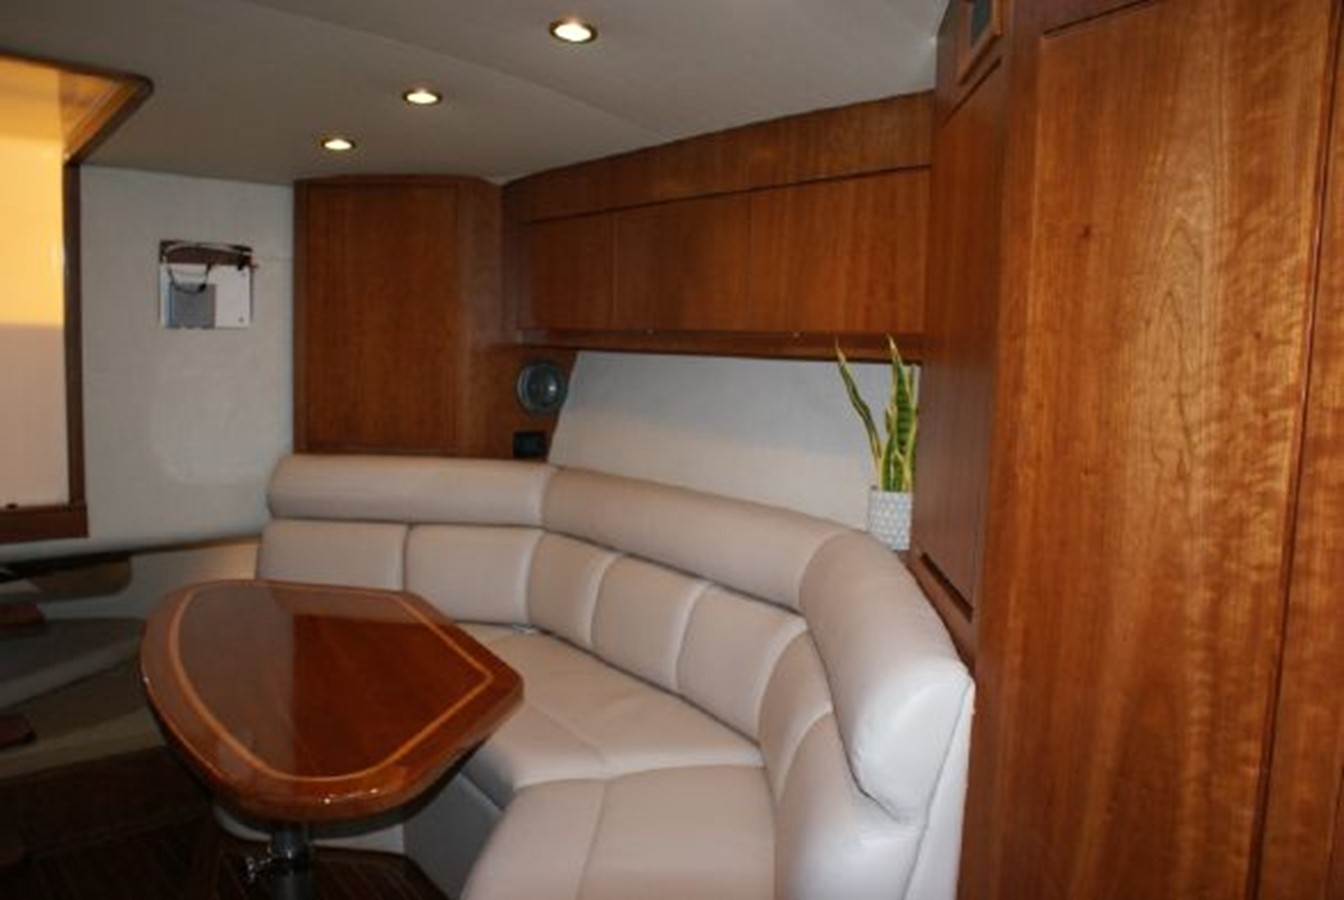 2011 JUPITER Express Walkaround 2432802